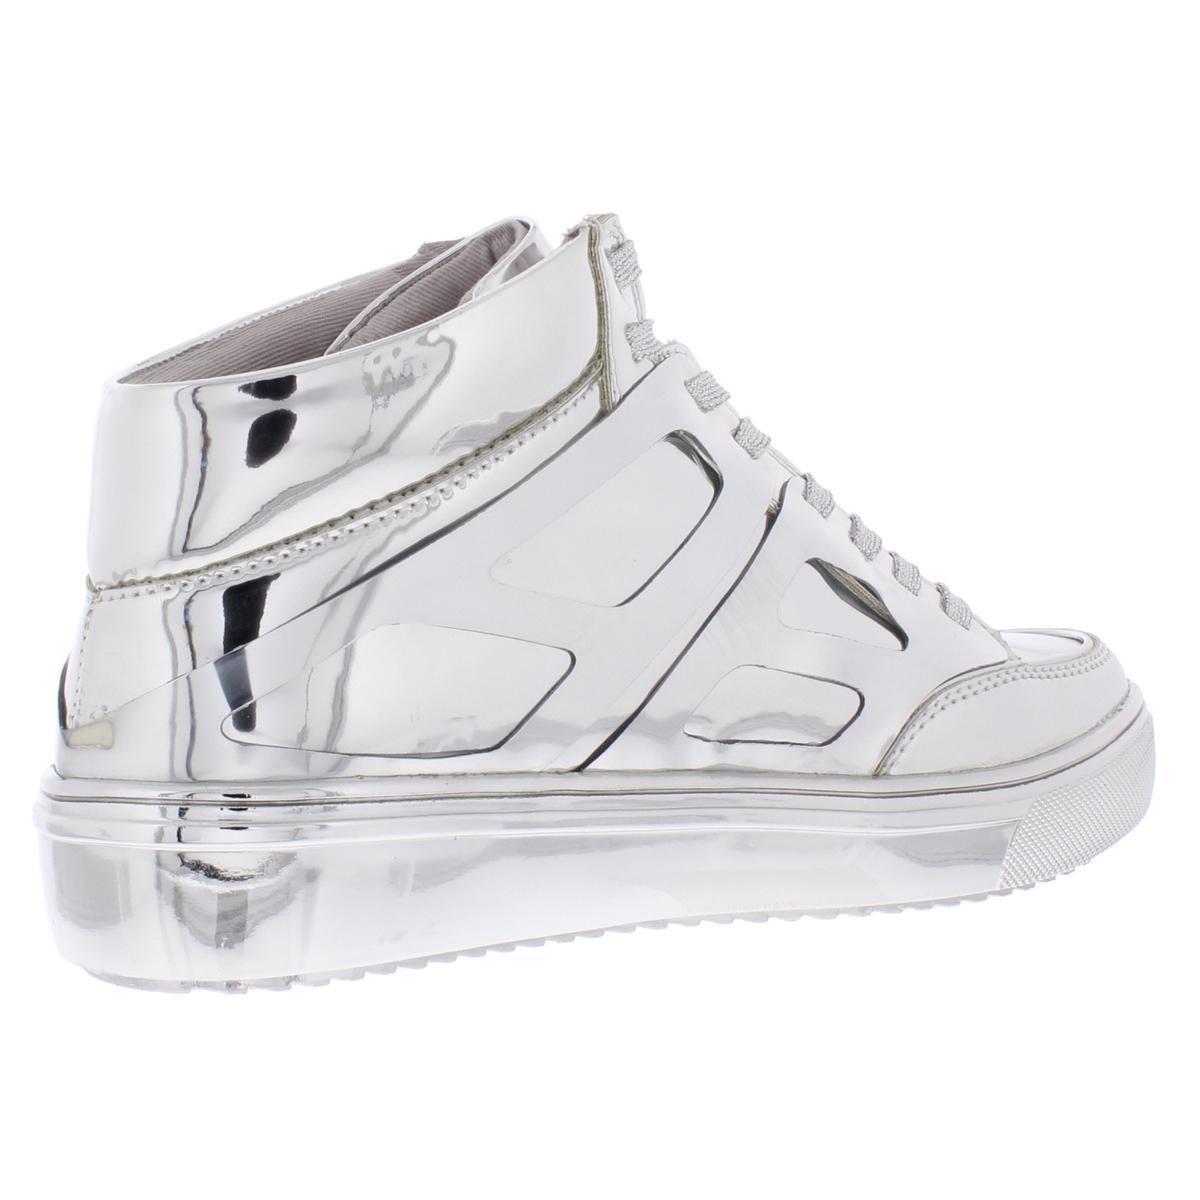 Steve-Madden-Womens-Tinman-2-Metallic-High-Top-Fashion-Sneakers-Shoes-BHFO-9056 thumbnail 6